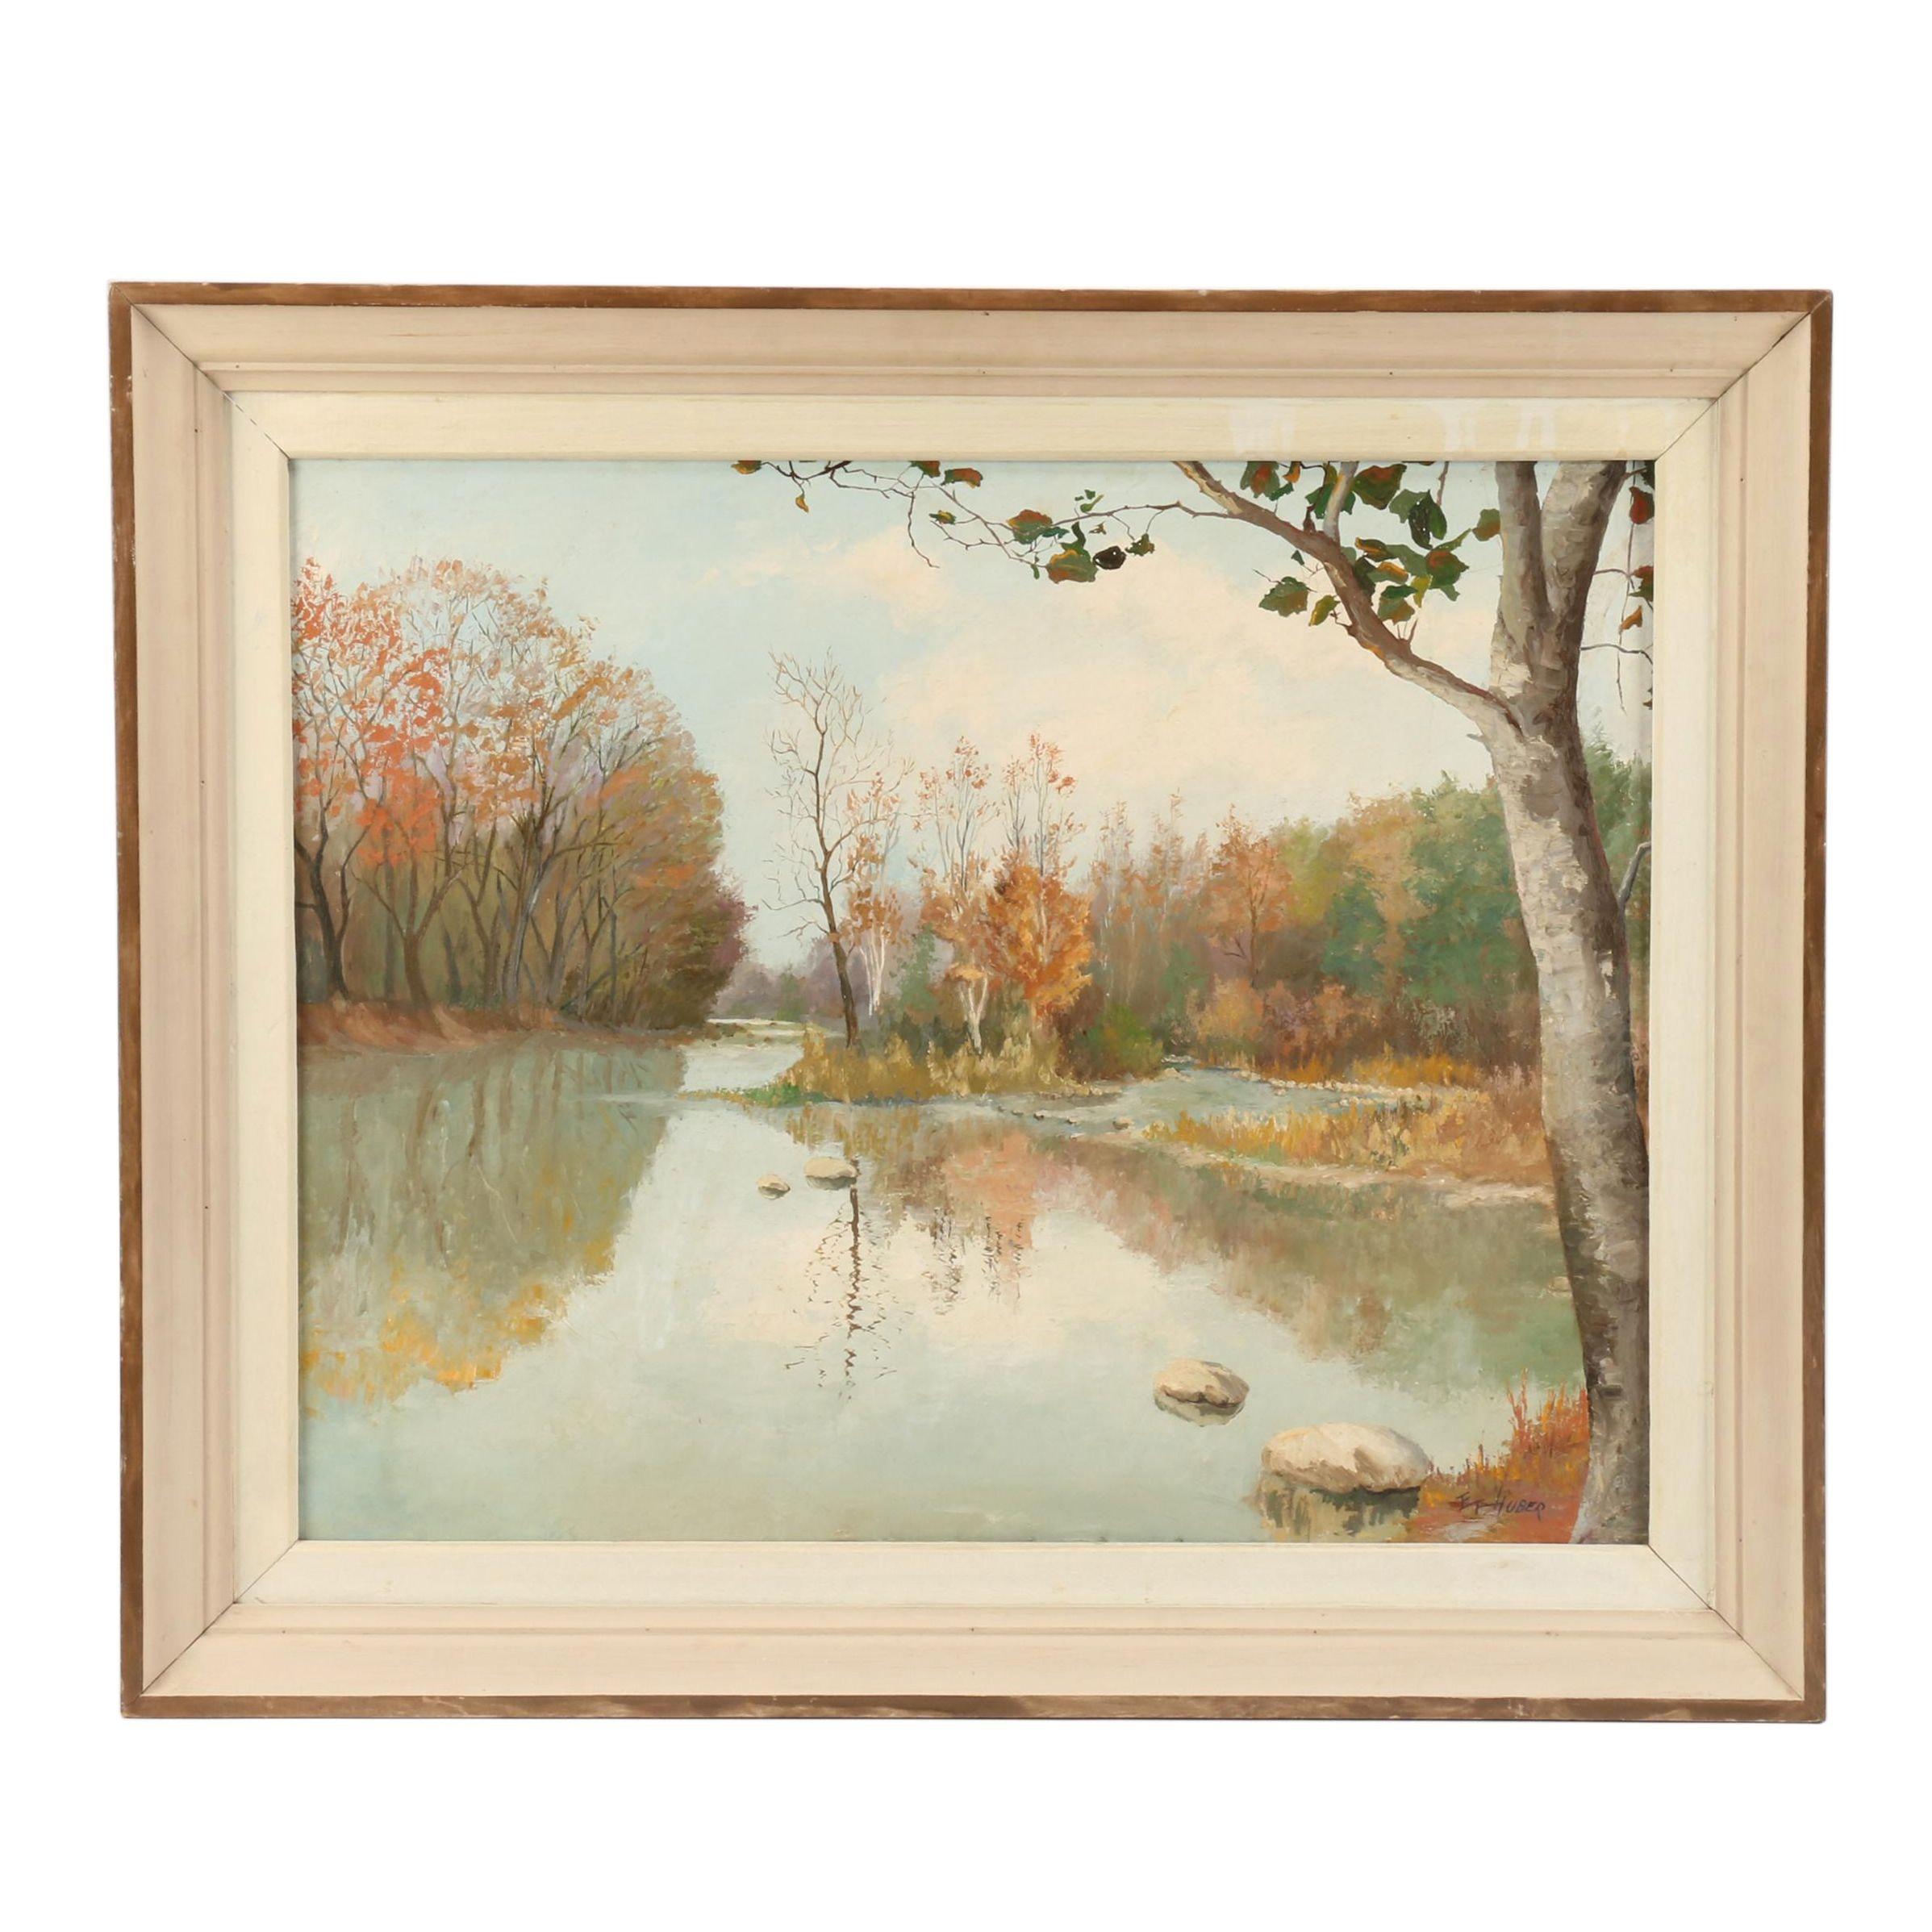 E.F. Huber Landscape Oil Painting